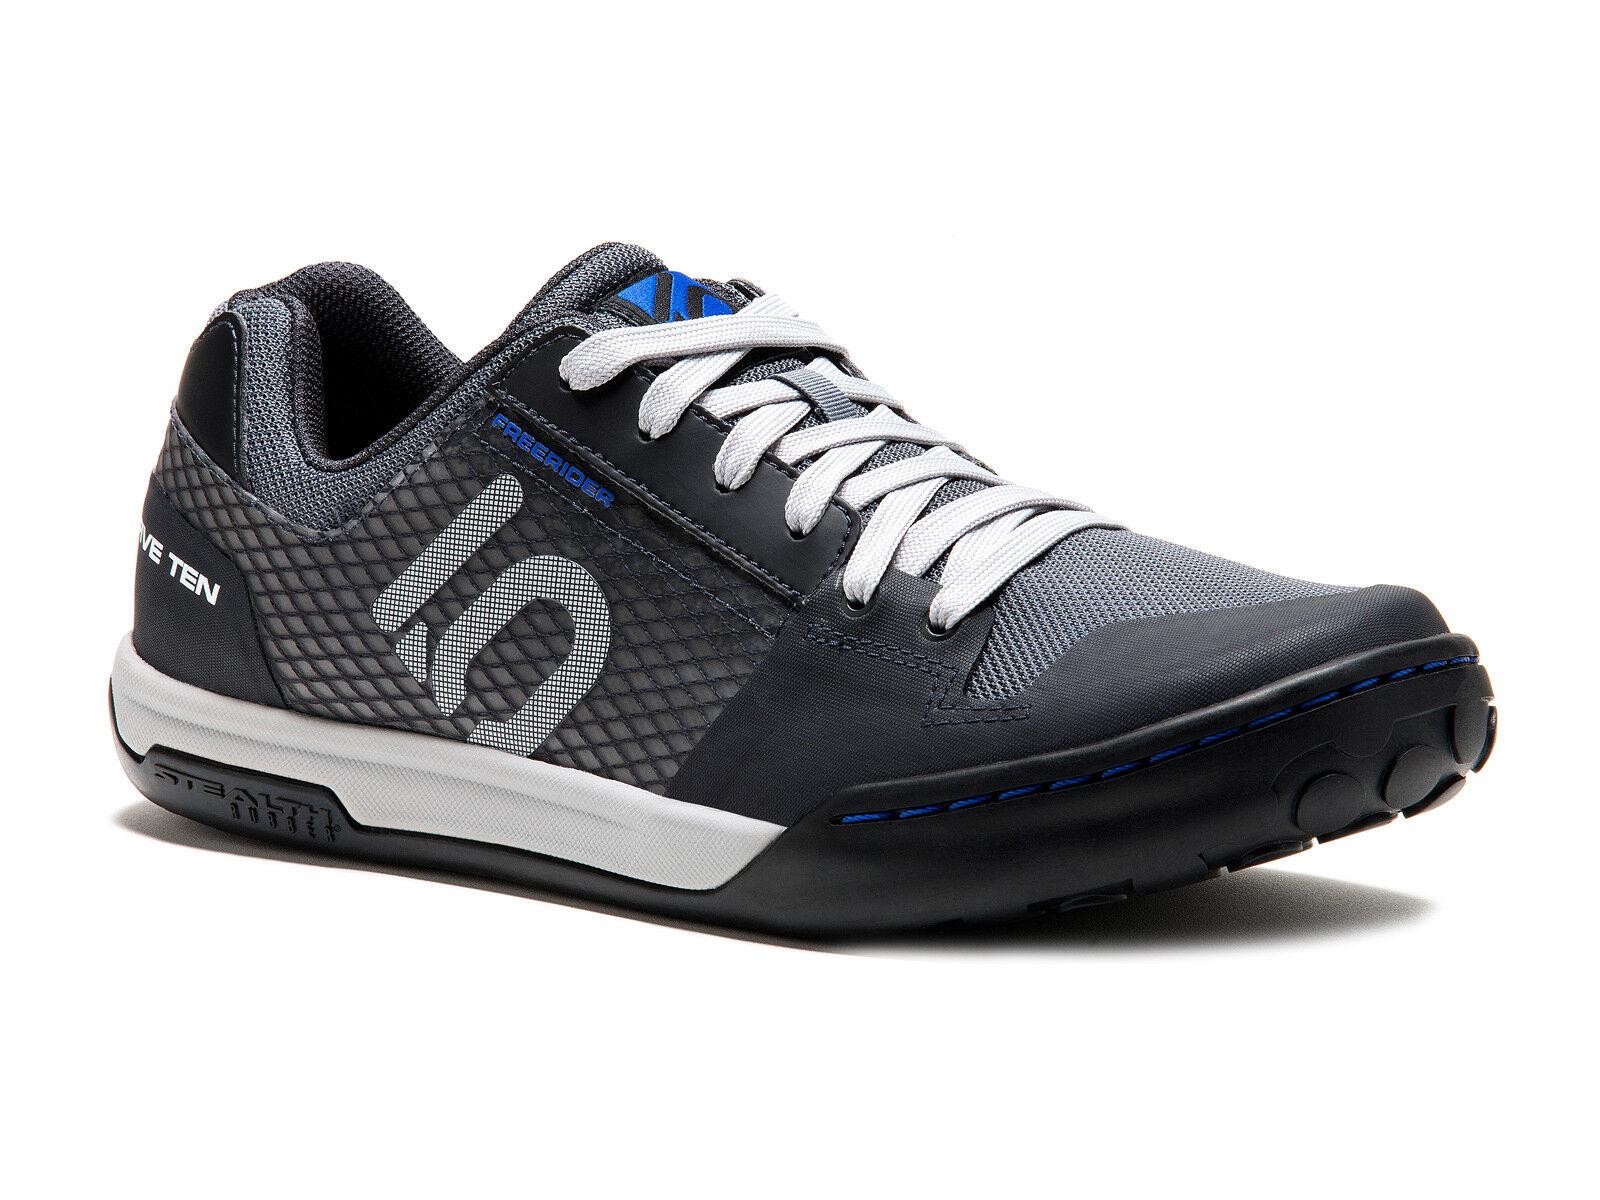 FiveTen freerider contact gris azul bicicleta zapatos-nuevo-VK  139,90